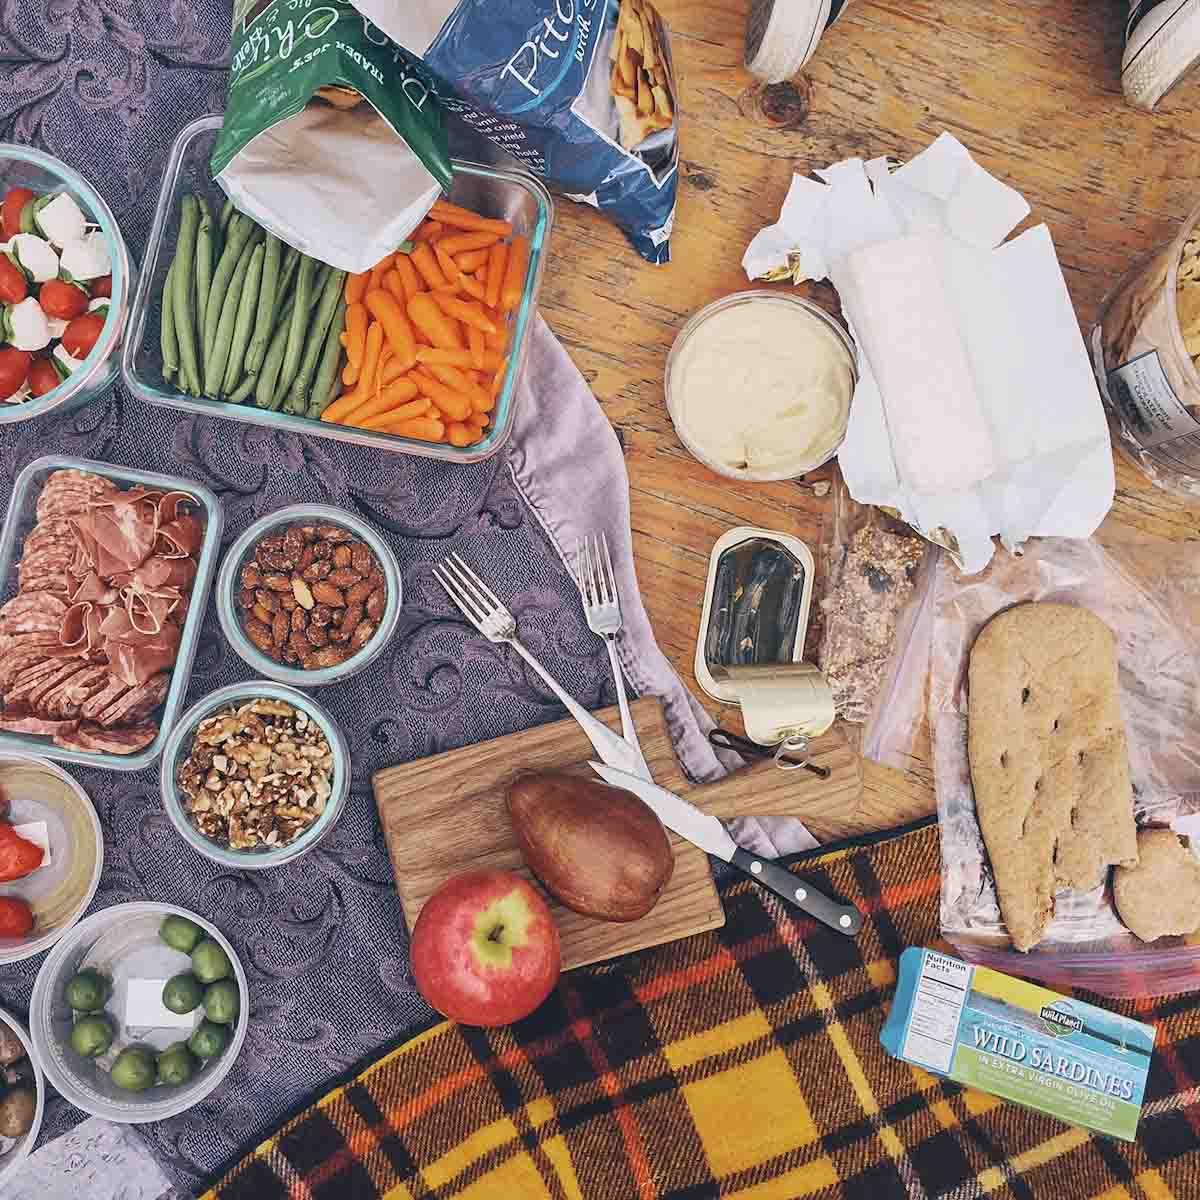 Culinary School picnic • theVintageMixer.com #culinaryschool